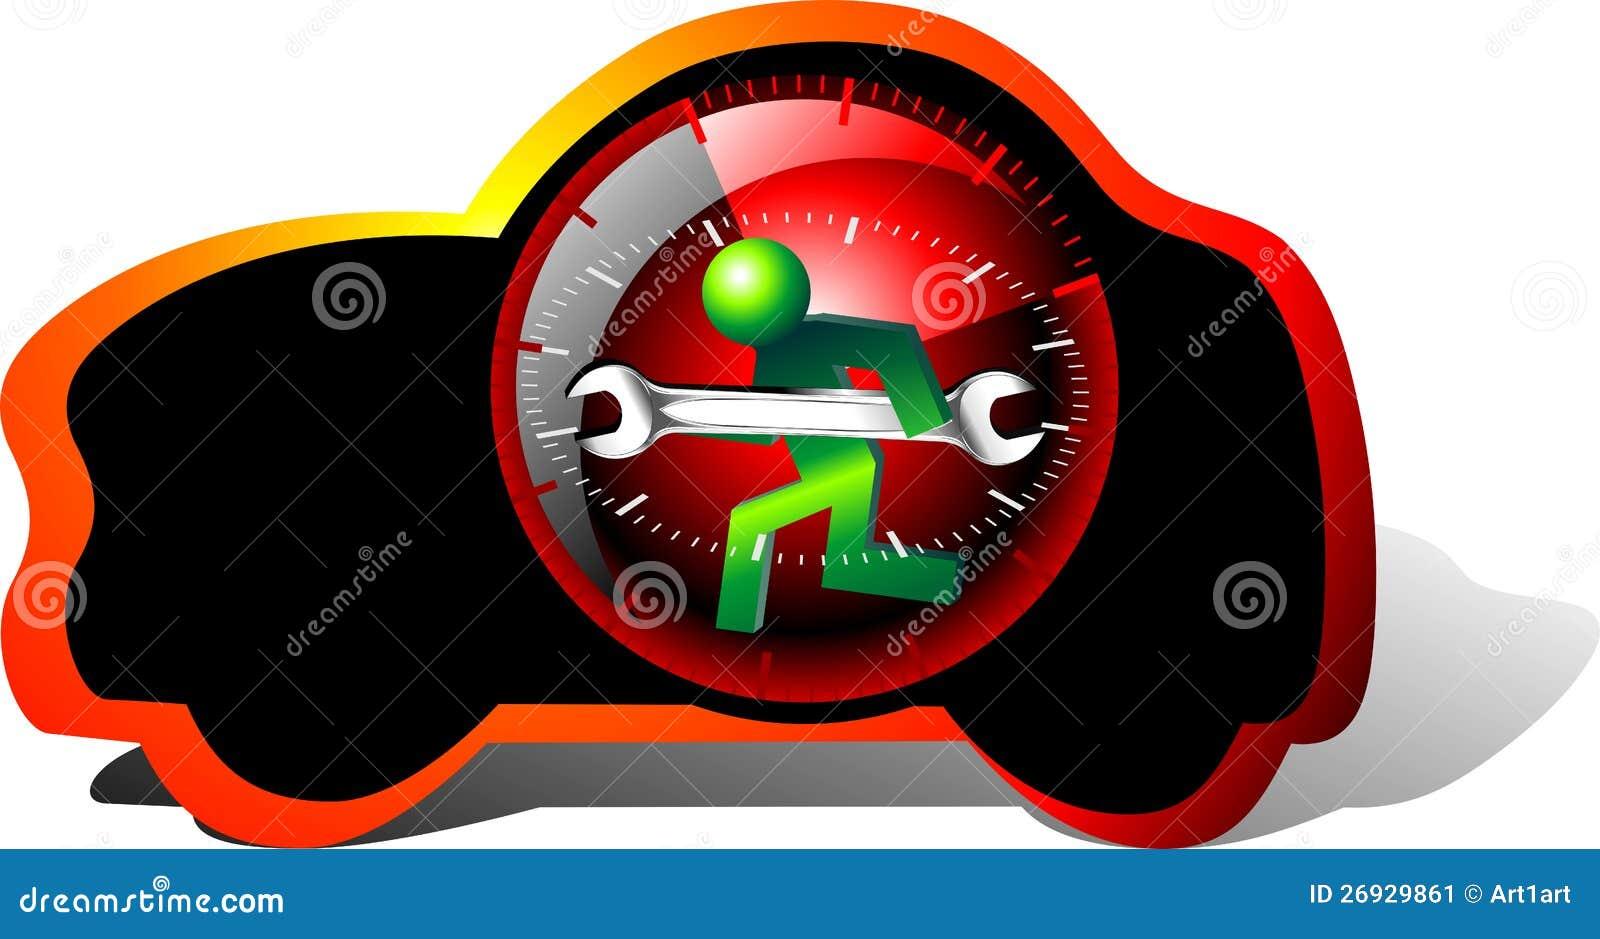 Internet Car Sales >> 24 Hour Maintenance Car Stock Image - Image: 26929861